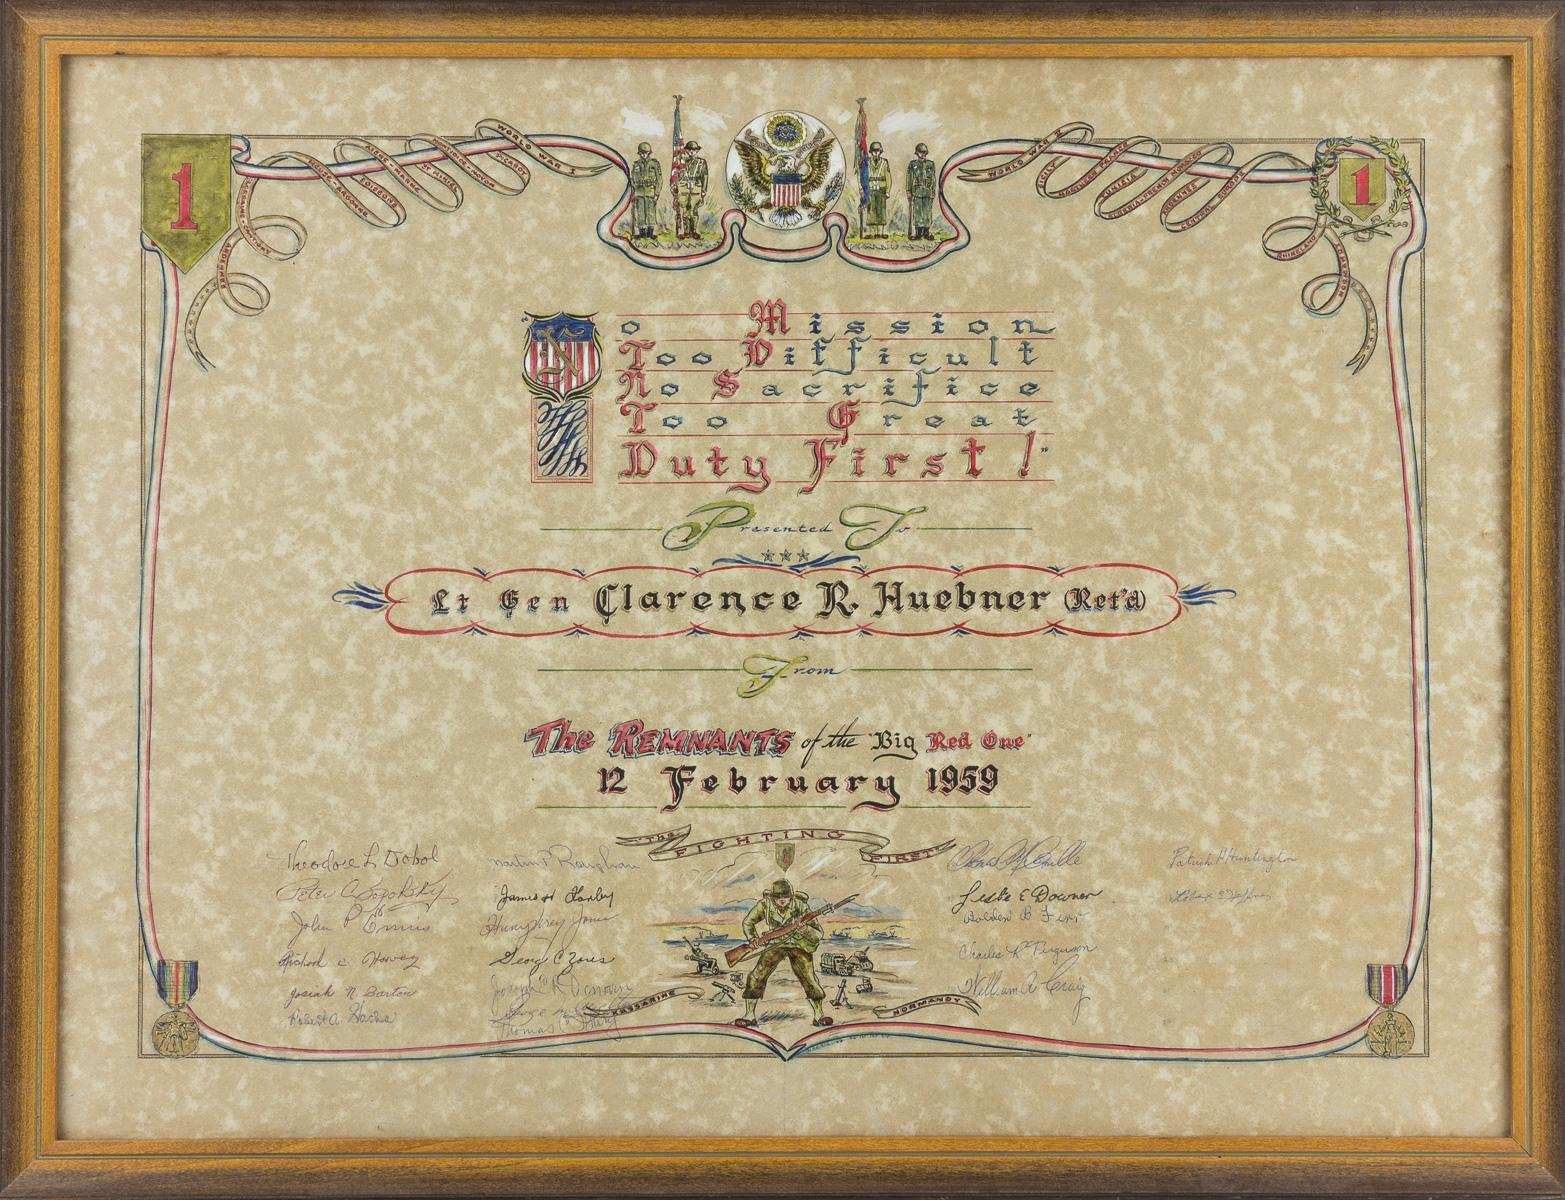 GEN. CLARENCE R. HUEBNER'S 1ST INFANTRY DIVISION PRESENTATION CERTIFICATE AND STATUETTE